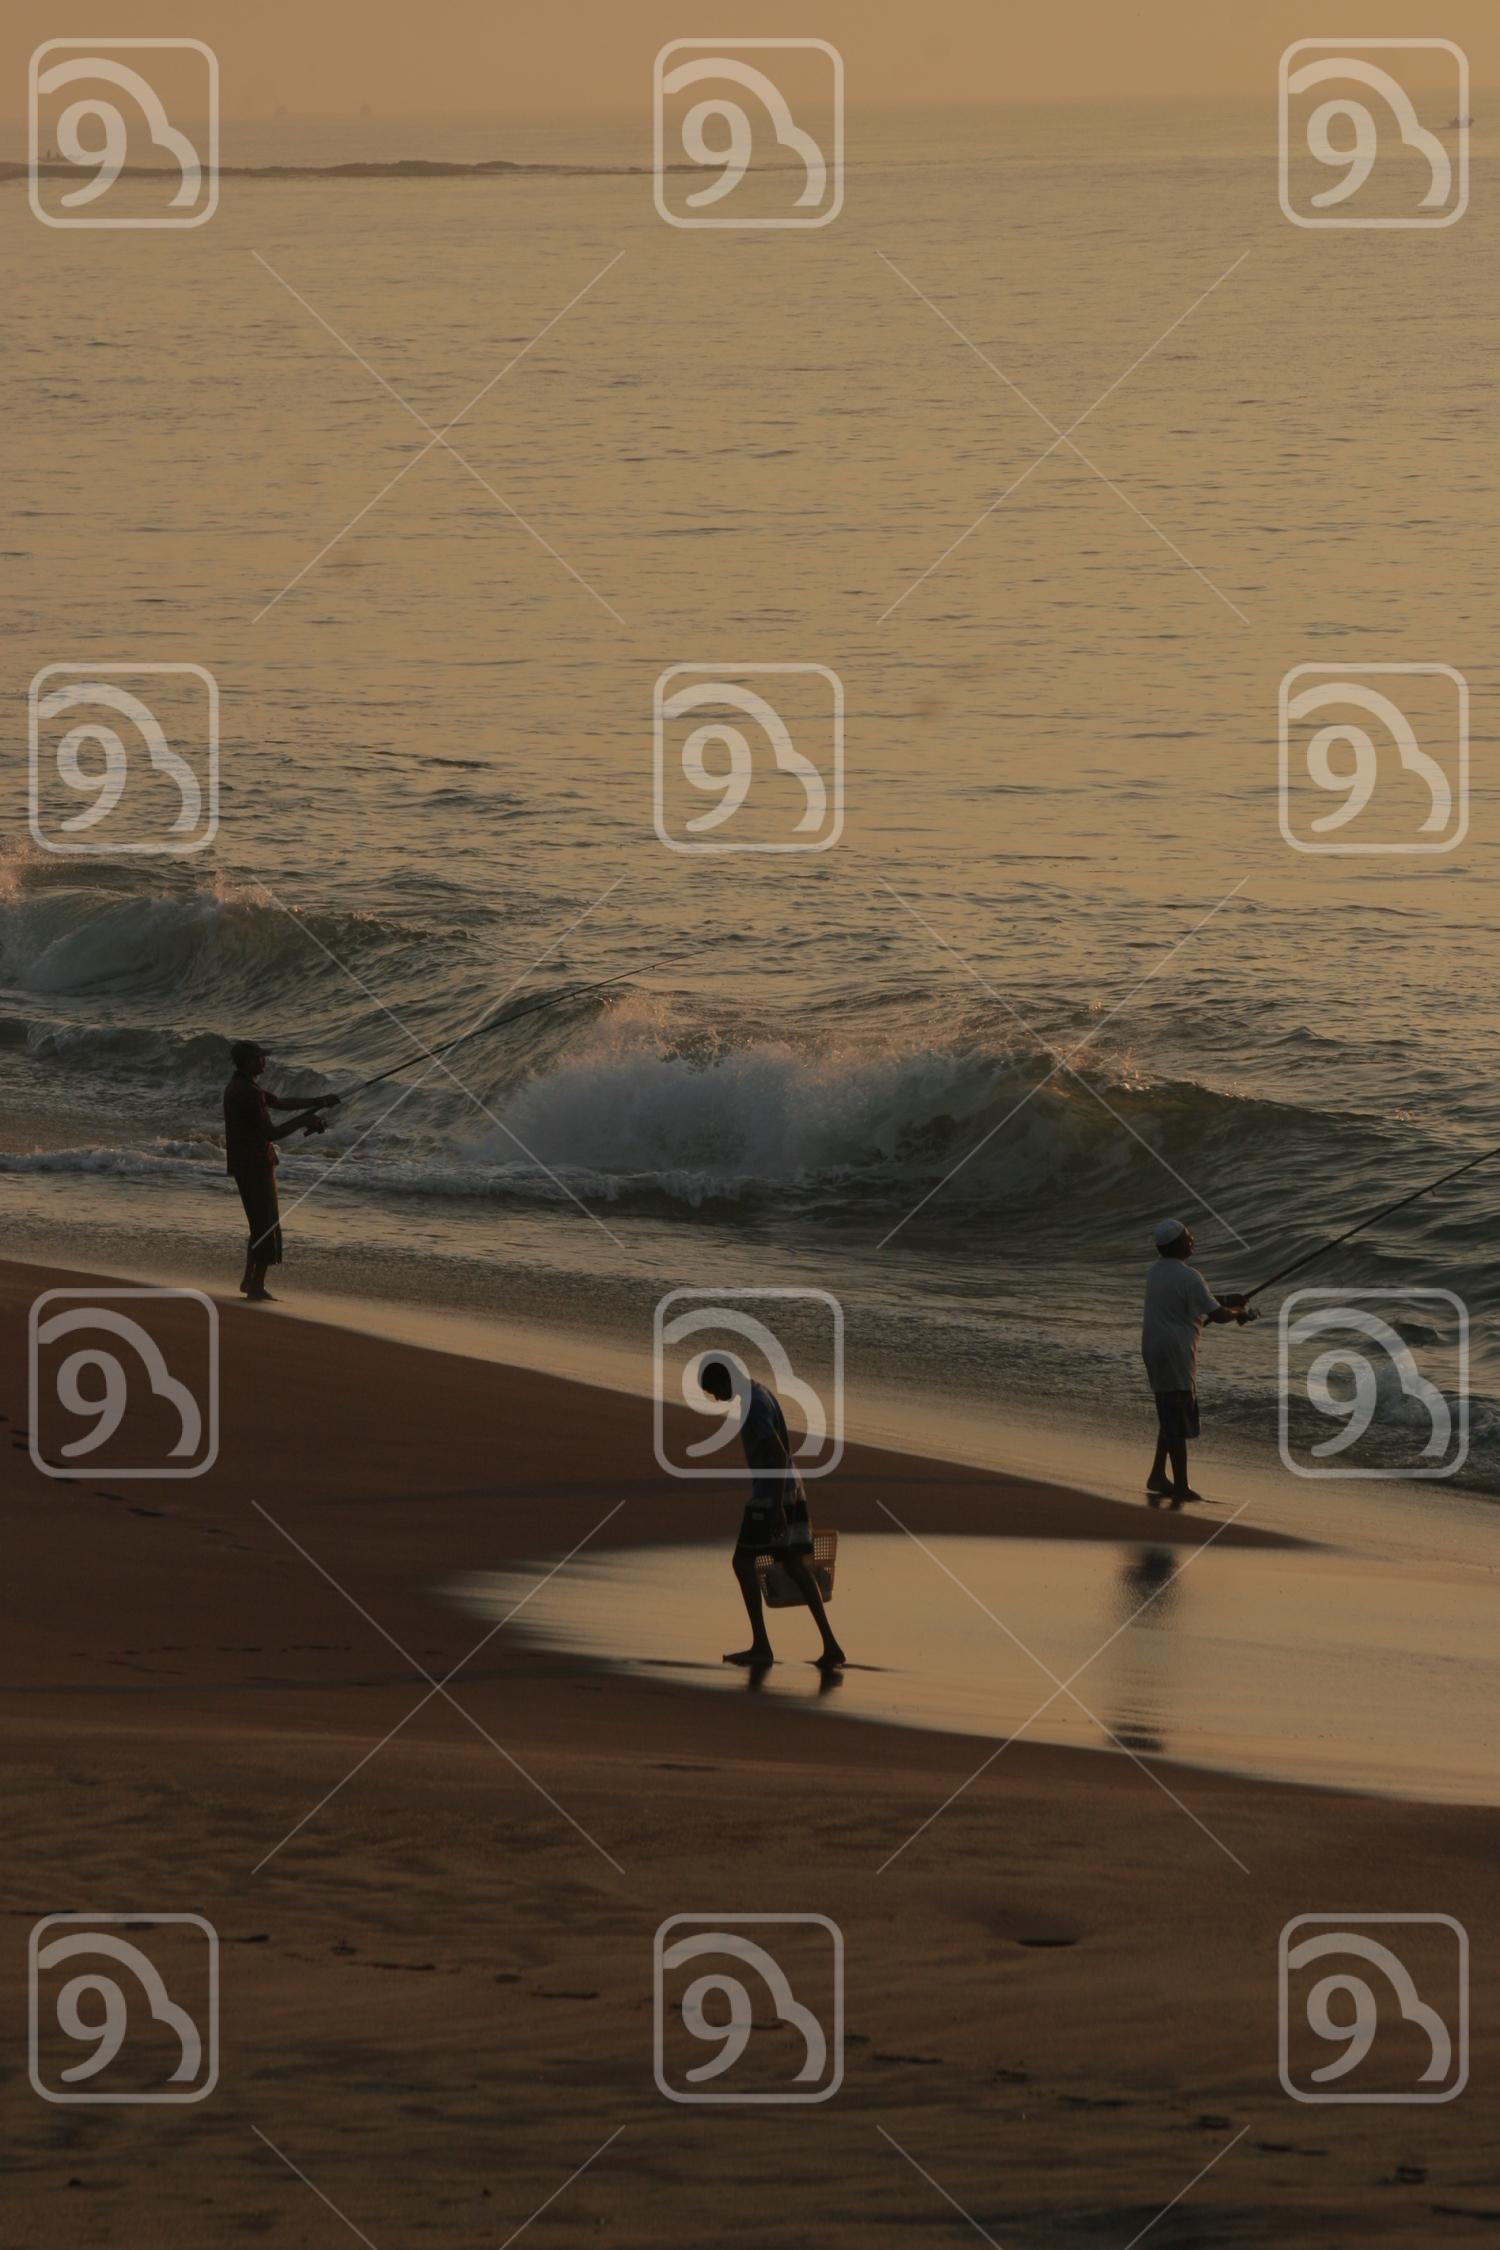 Fishing in Hambantota, Southern of Sri Lanka